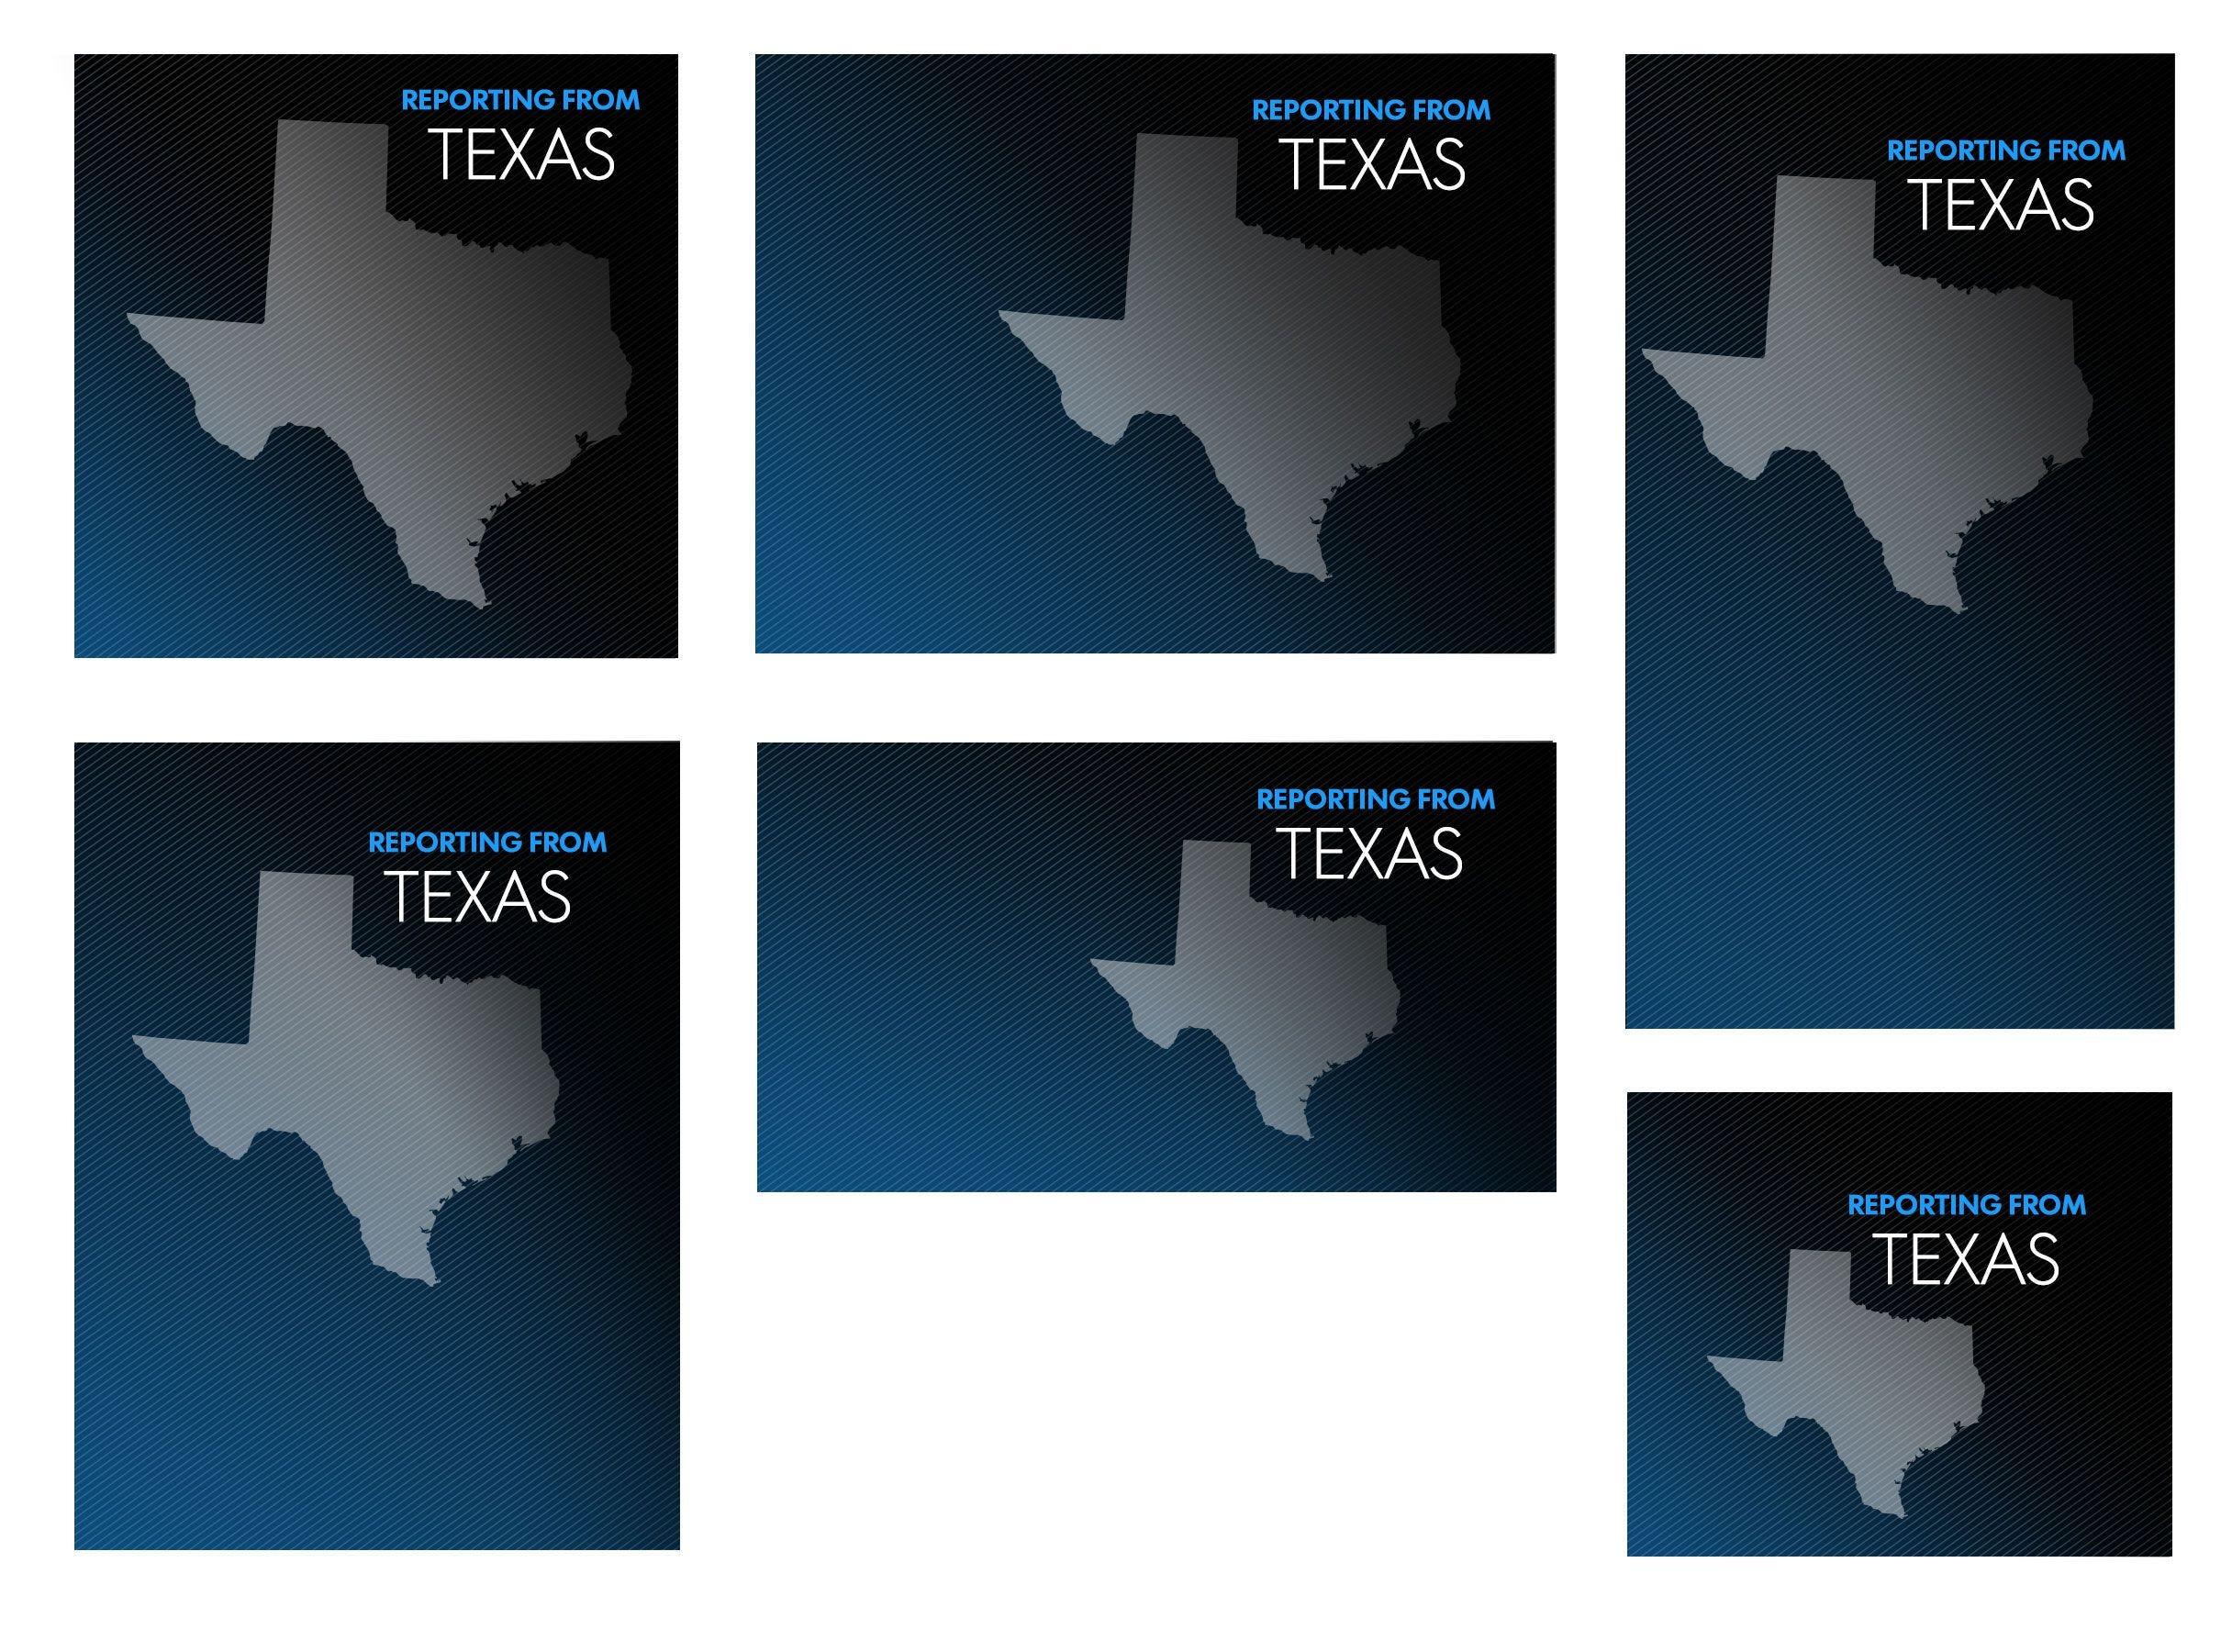 Ailing asylum seeker returned to Texas detention center